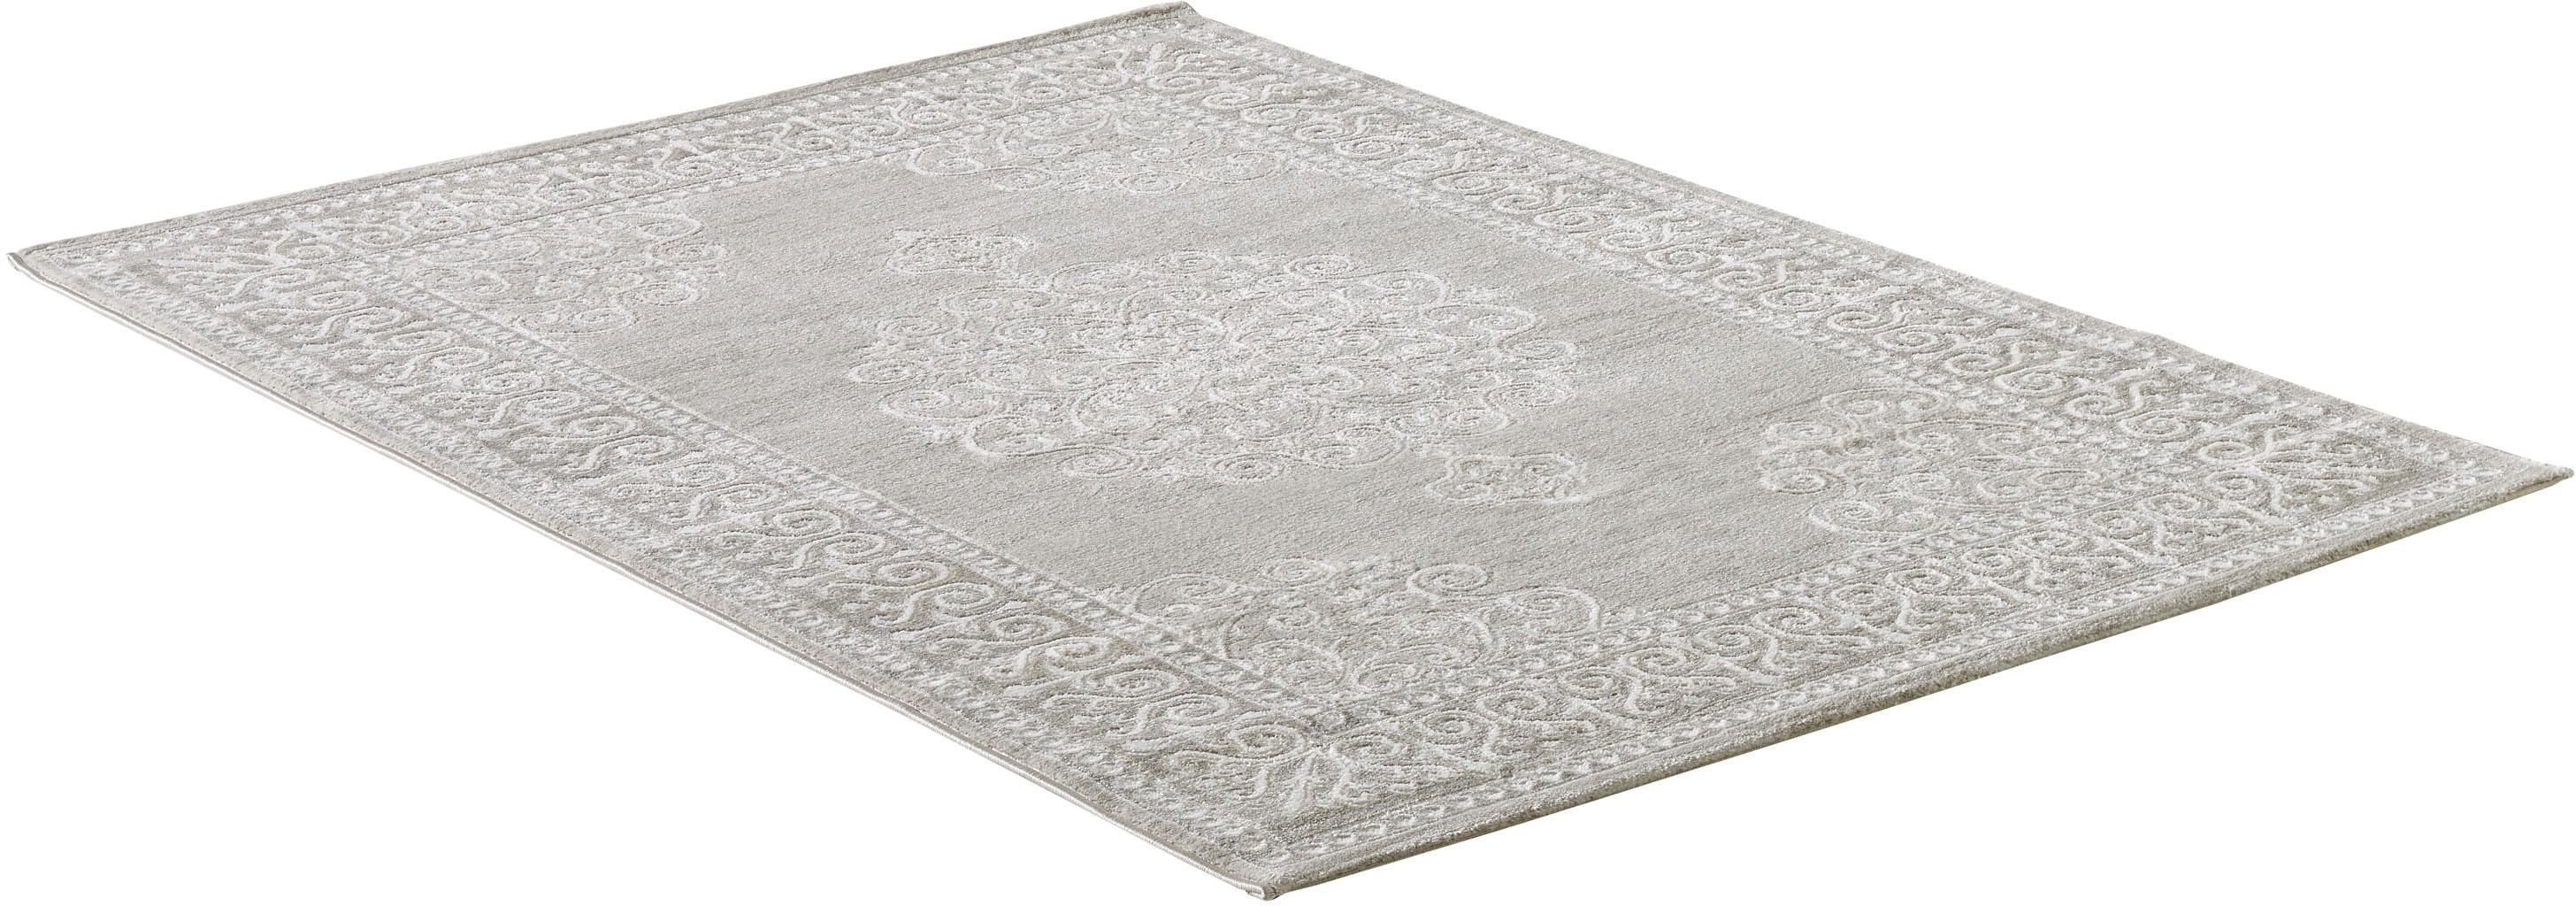 Teppich Harmony 3204 Sanat Teppiche rechteckig Höhe 12 mm maschinell gewebt